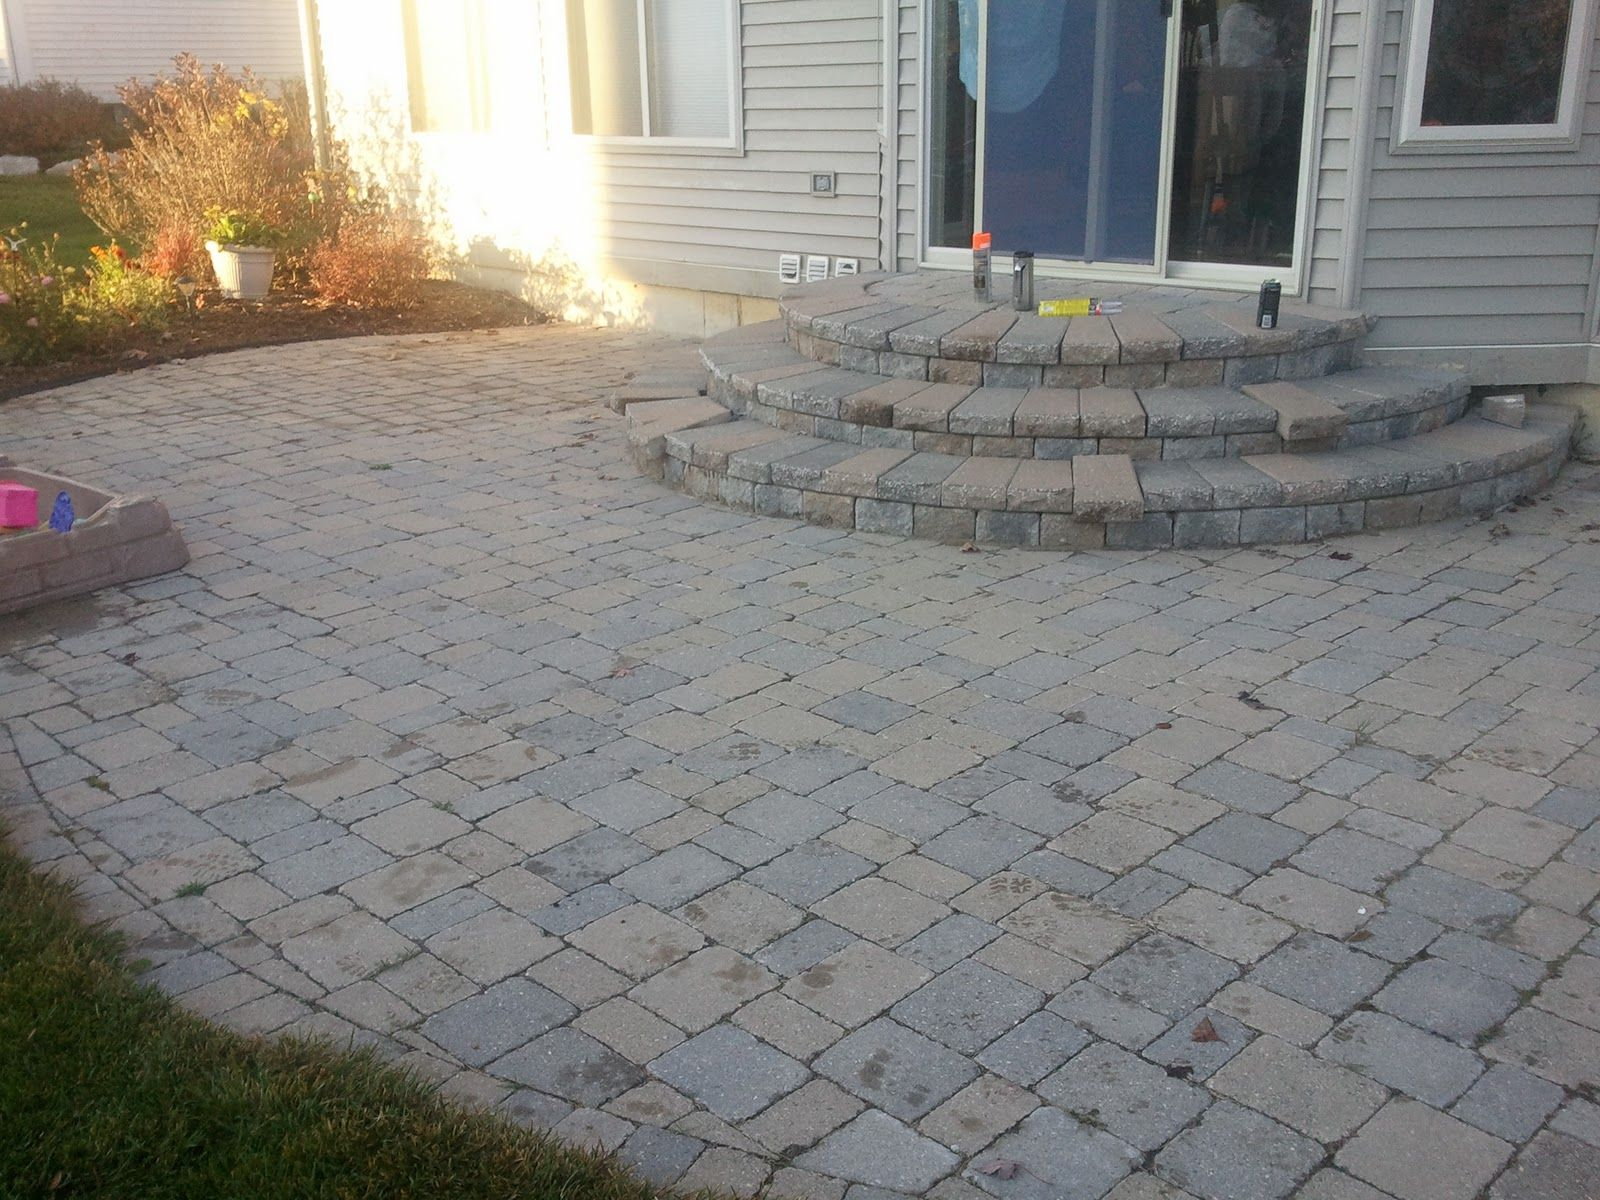 Paver Patio Ideas Pictures | Brick Pavers Ann Arbor,Canton,Patios,Repair,